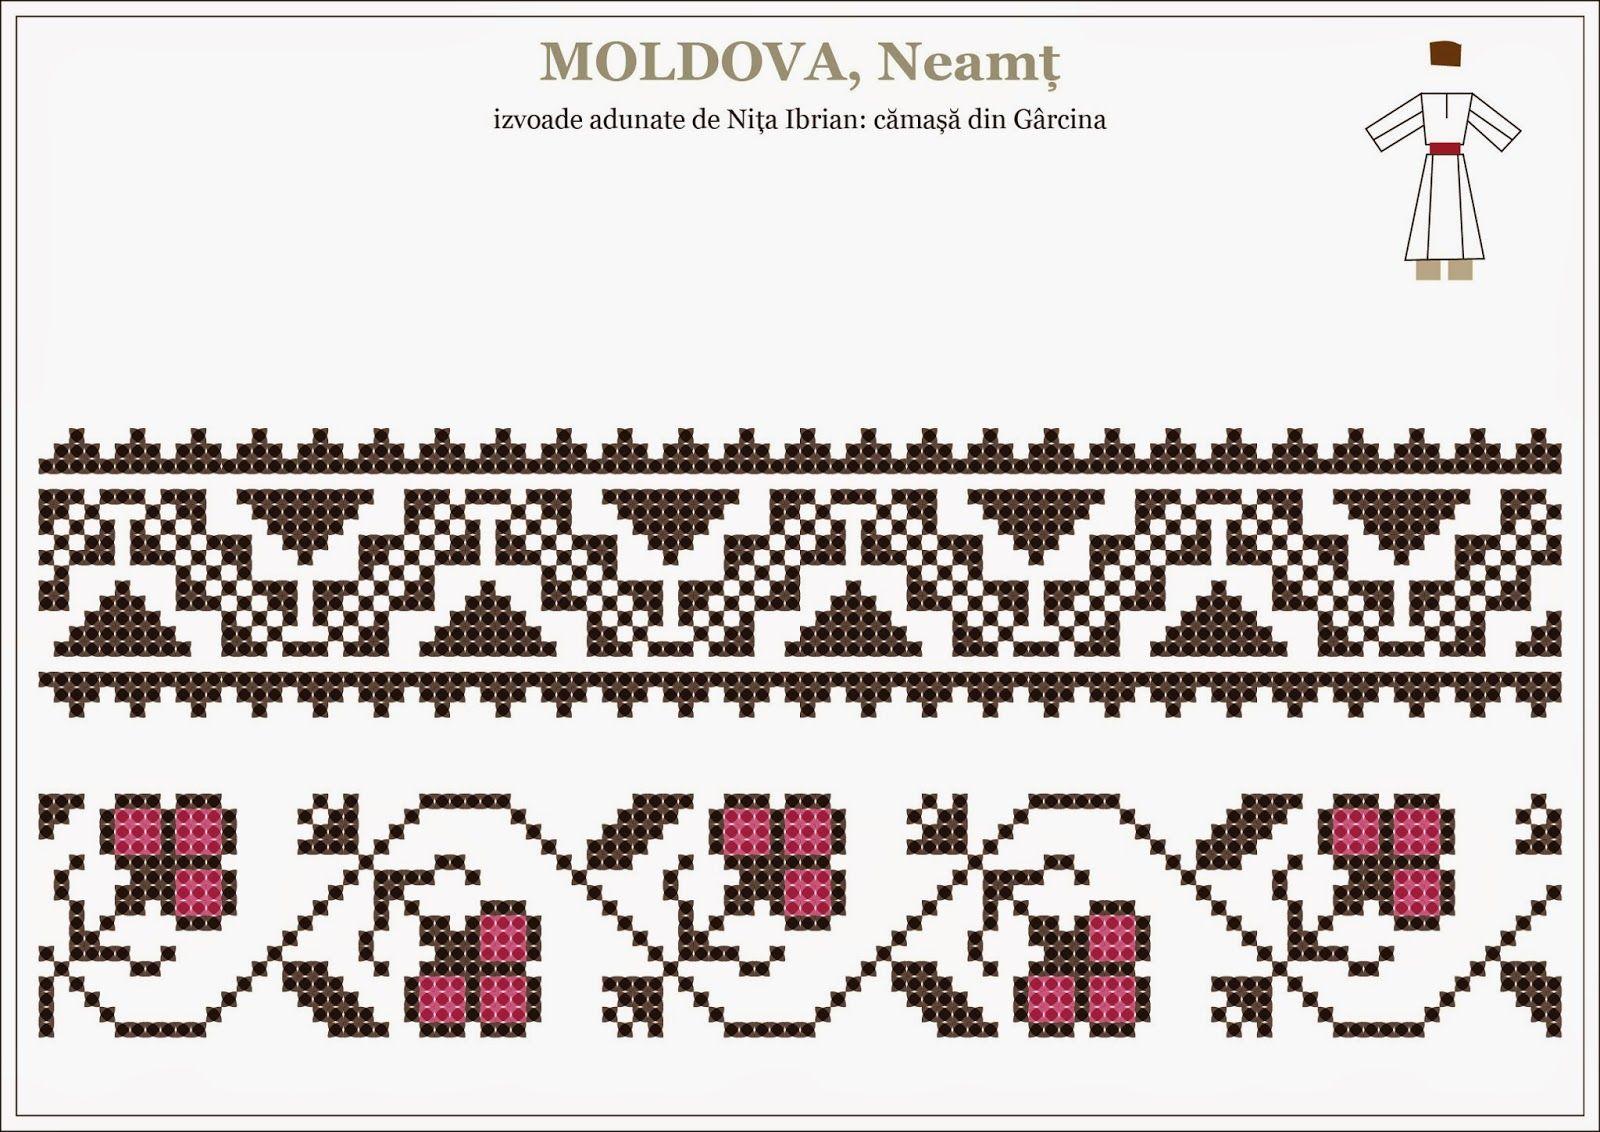 NEAMT+nita+ibrian+-+Cuiejdi-Garcina+7.jpg 1.600×1.132 piksel